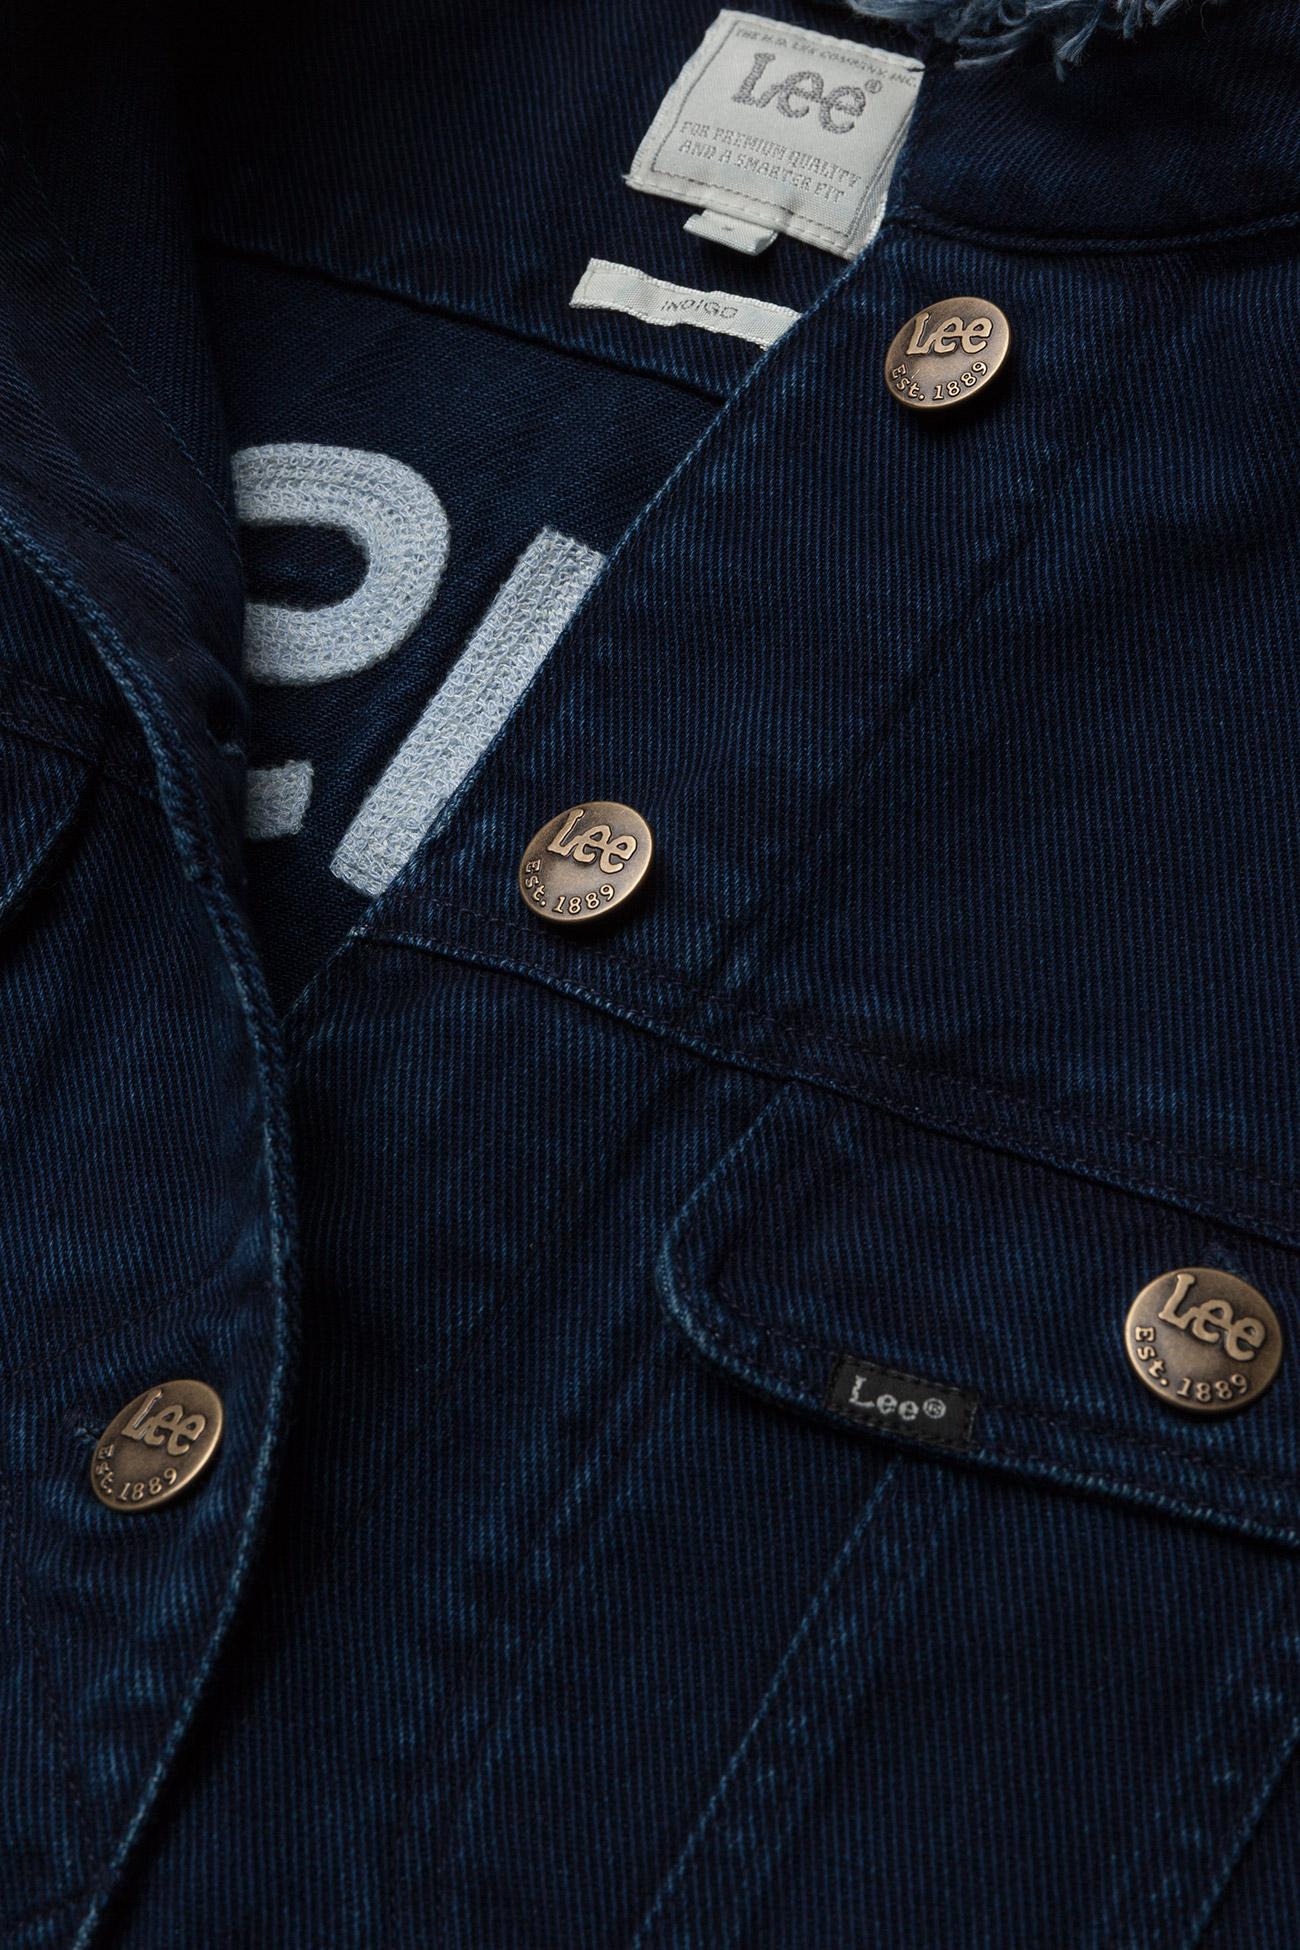 Jeans Sleeve BlueLee Bell Sleeve Bell Riderdusk Riderdusk BlueLee OXPZukiT